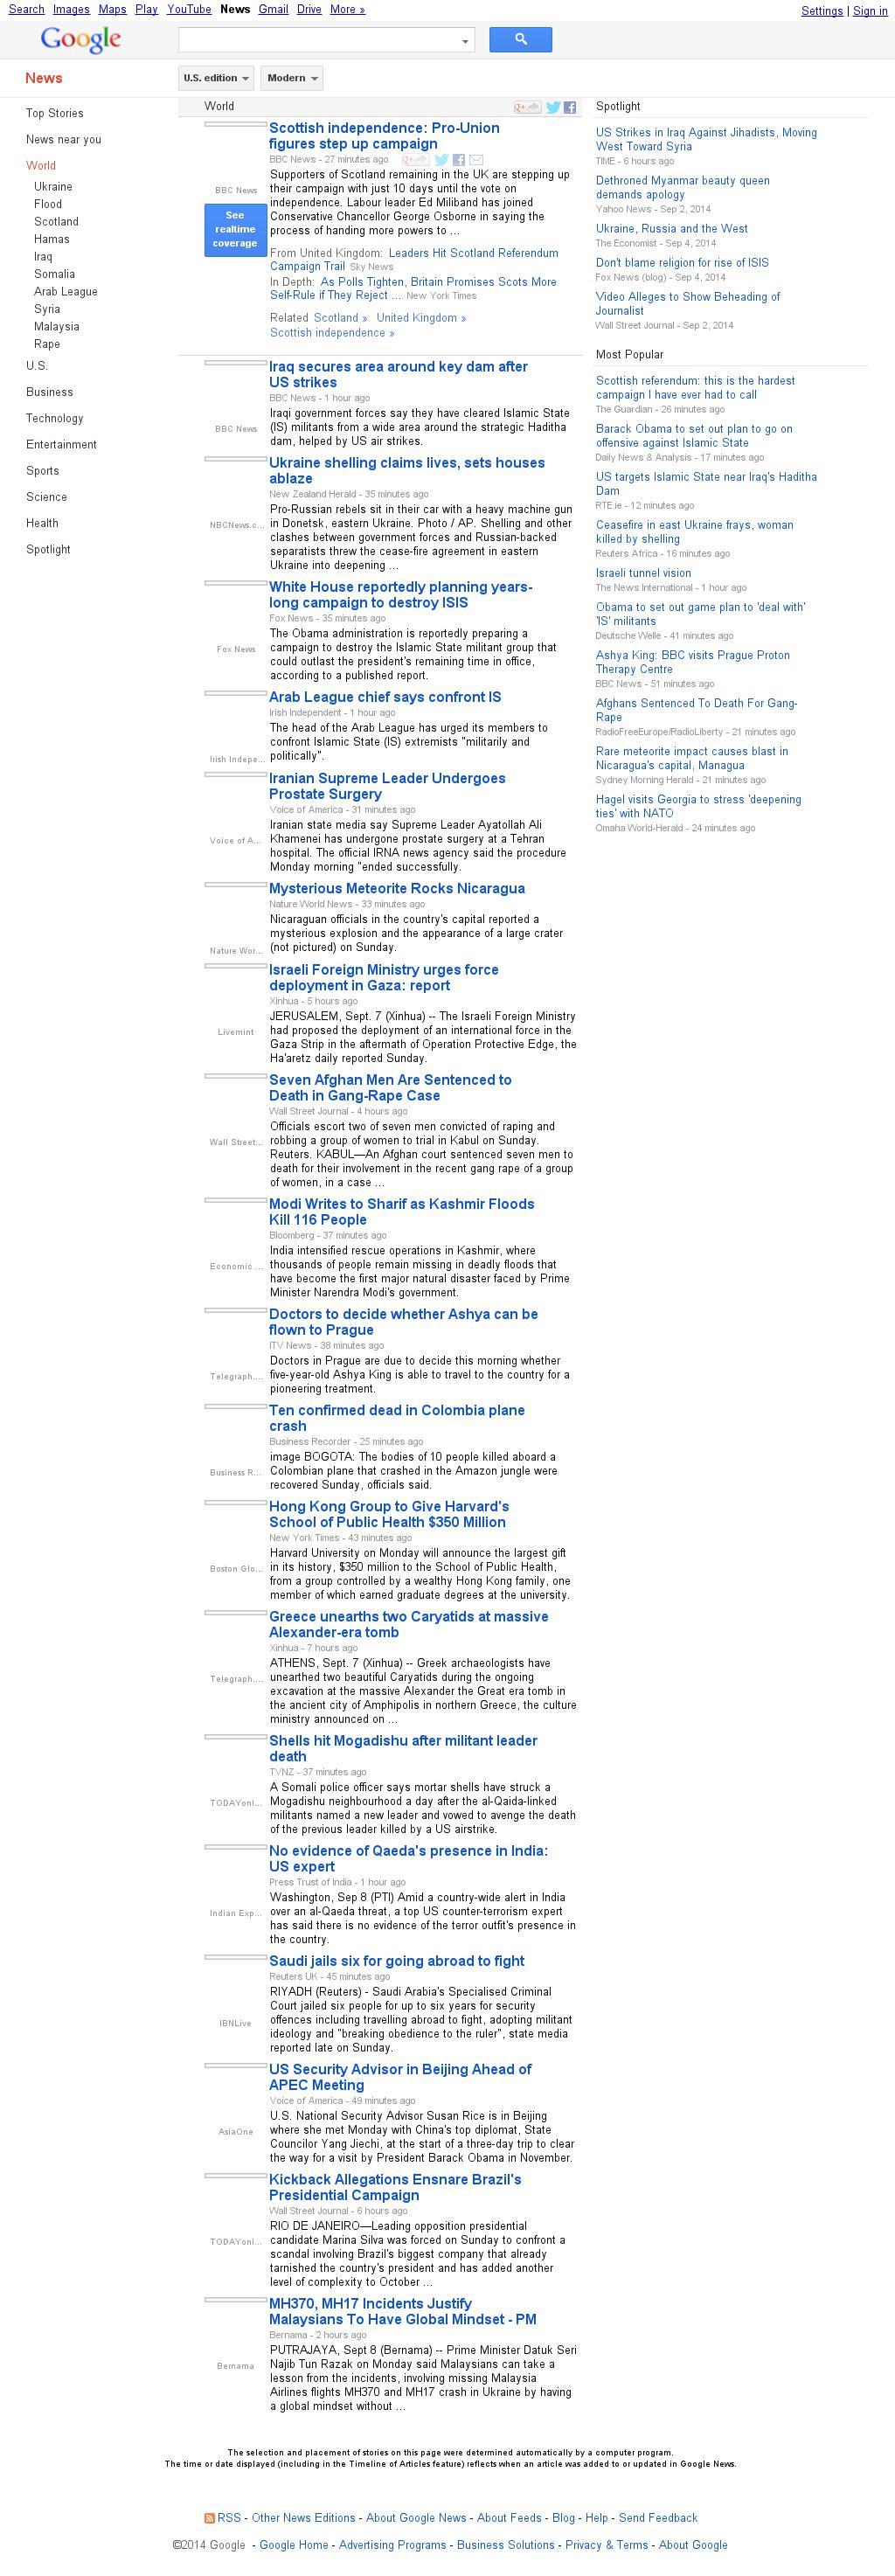 Google News: World at Monday Sept. 8, 2014, 6:06 a.m. UTC